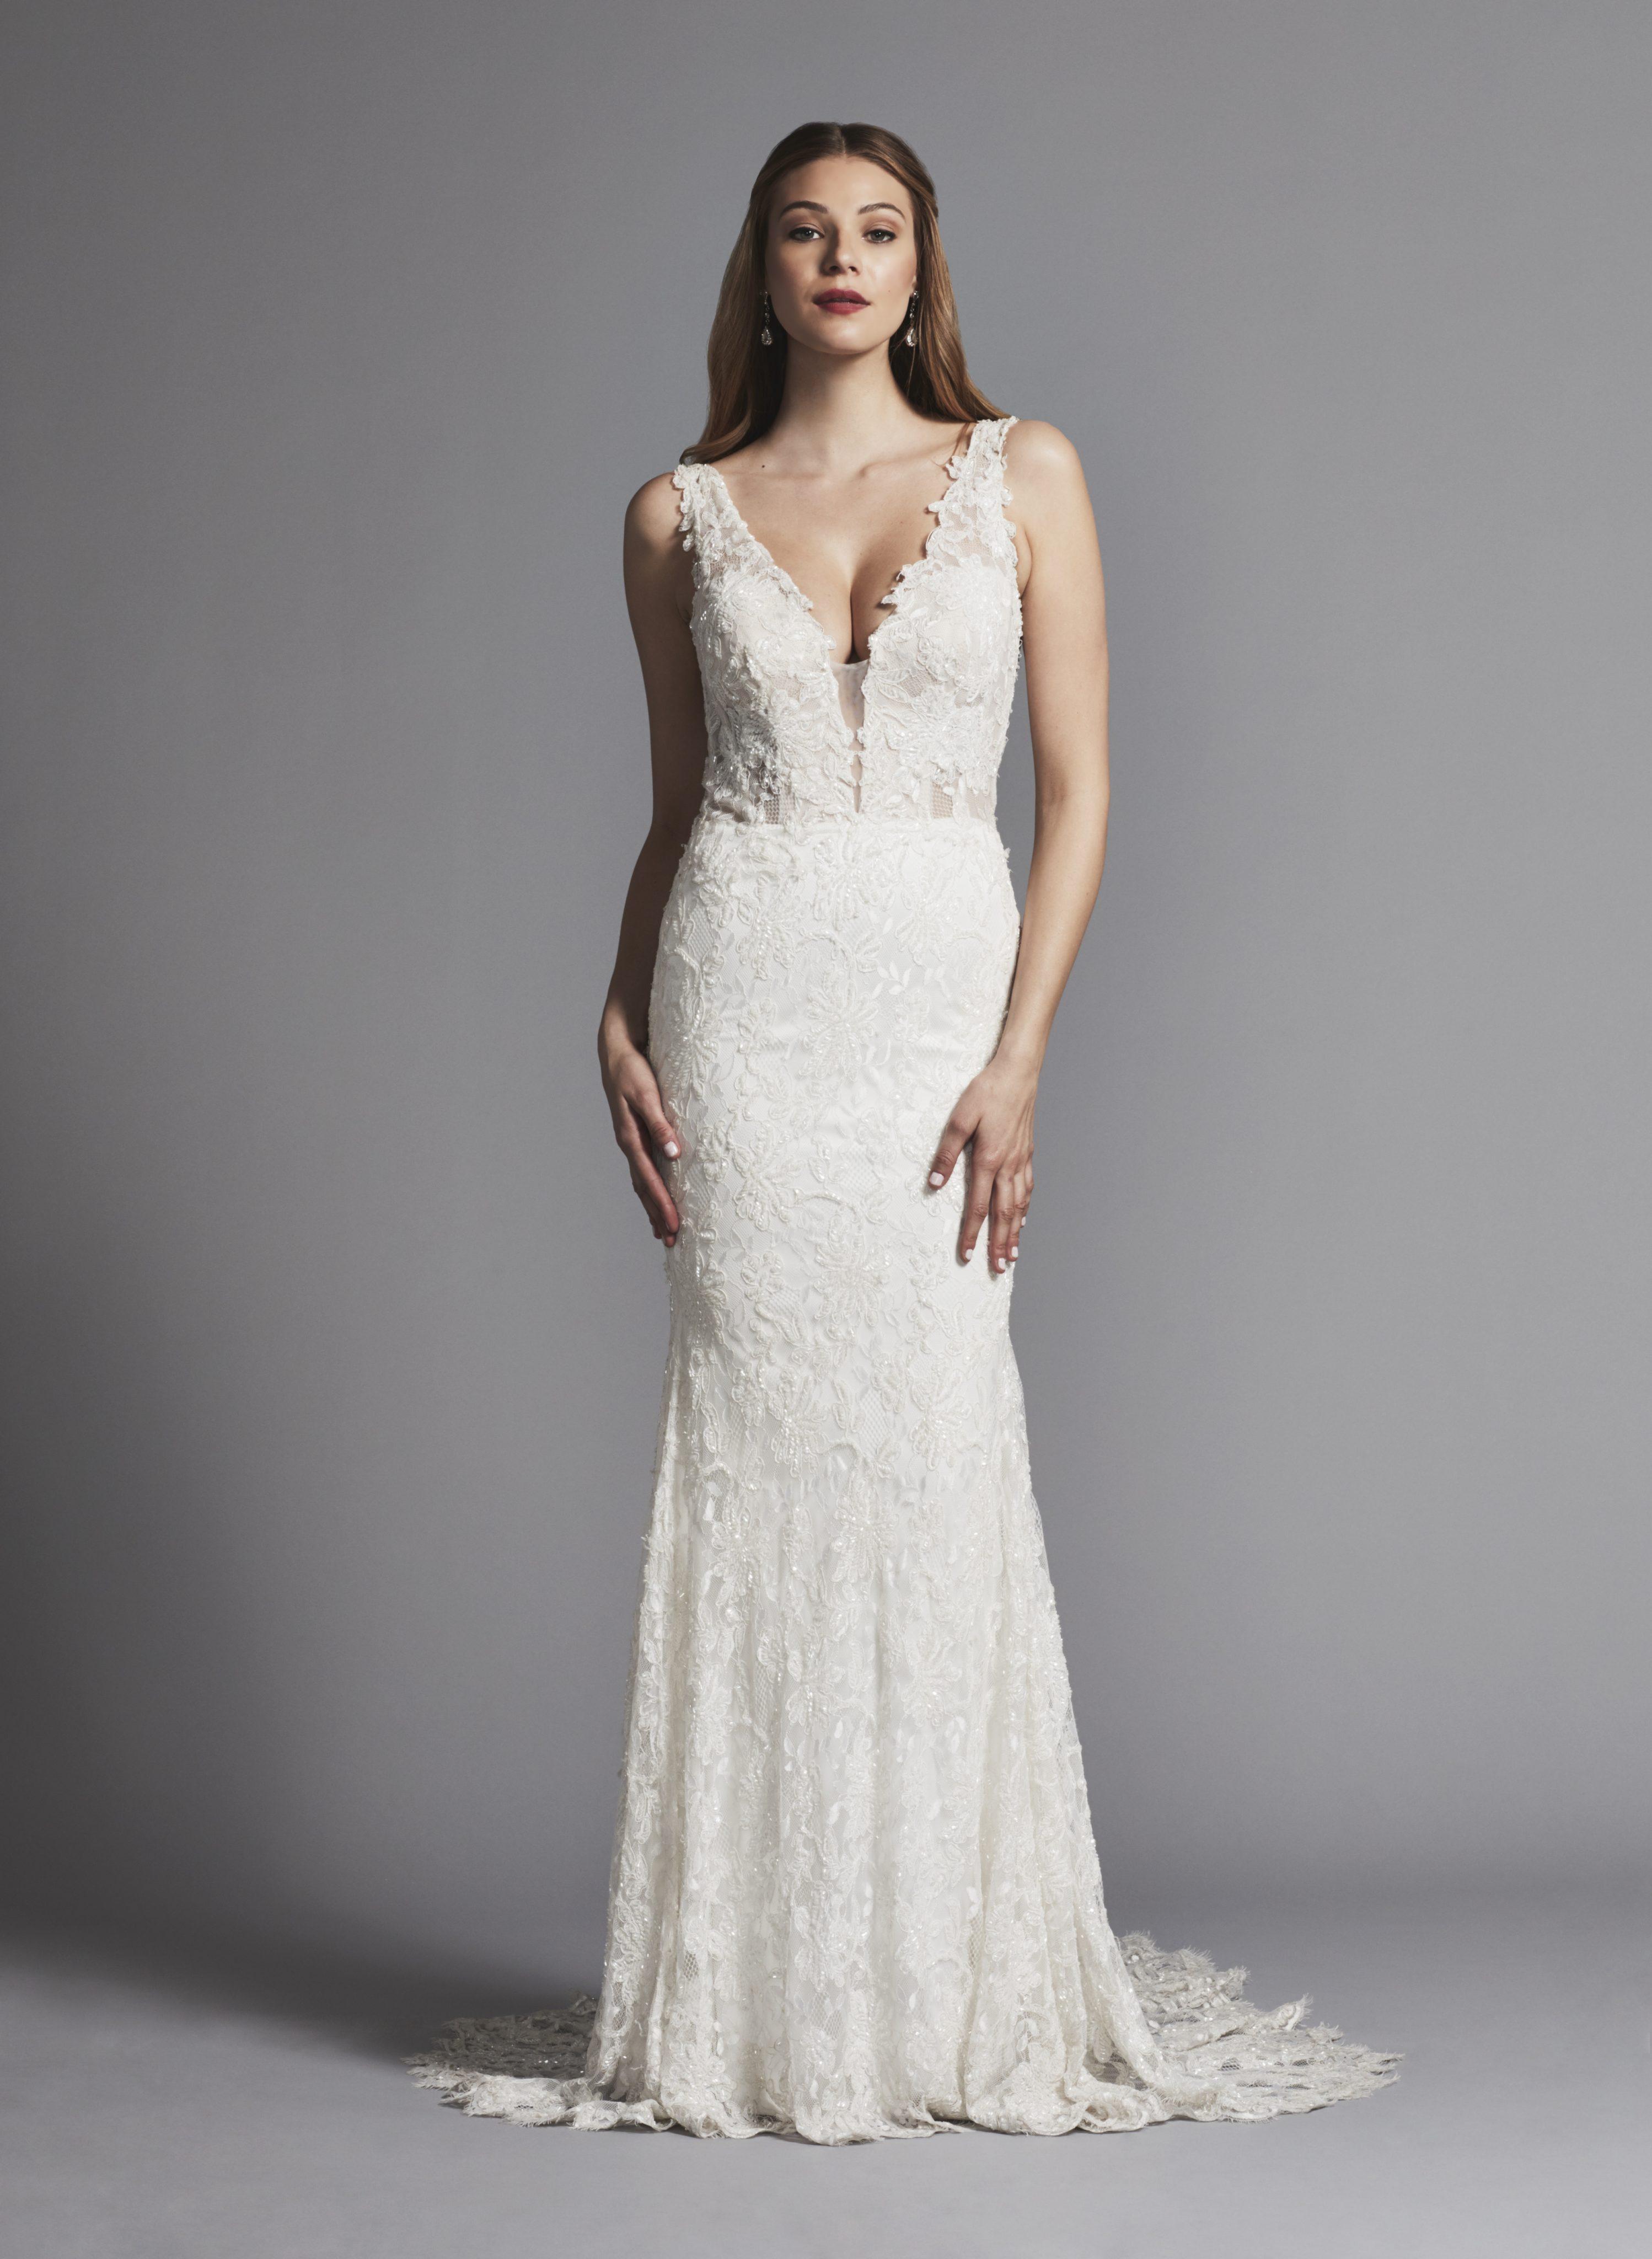 Sleeveless Lace Sheath Wedding Dress Kleinfeld Bridal